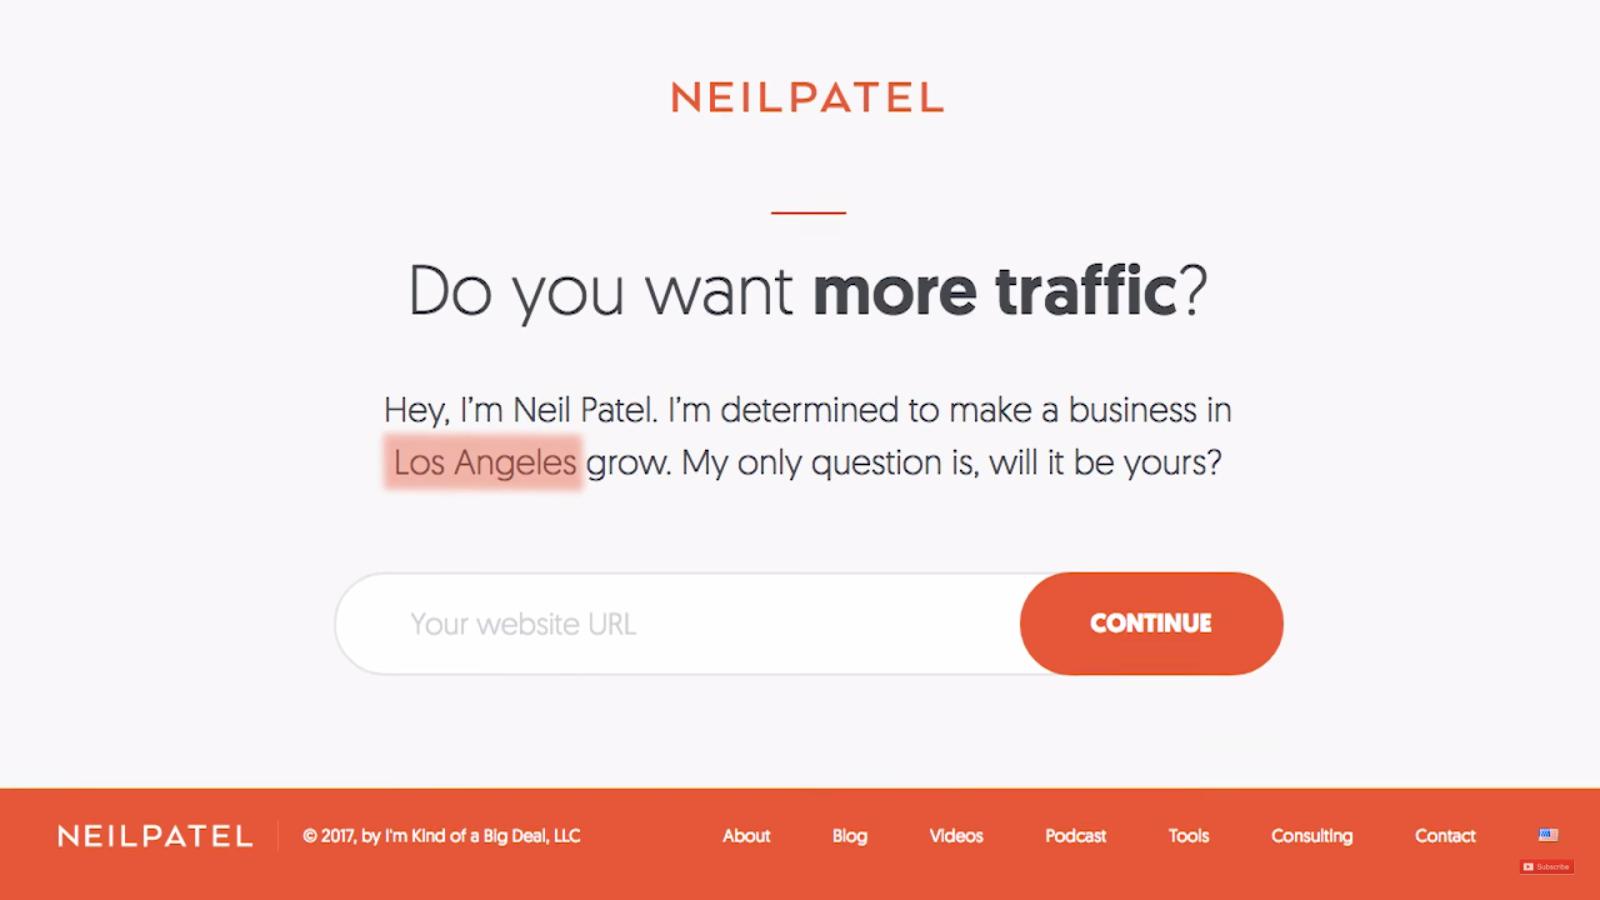 Neil Patel Geotarget 1